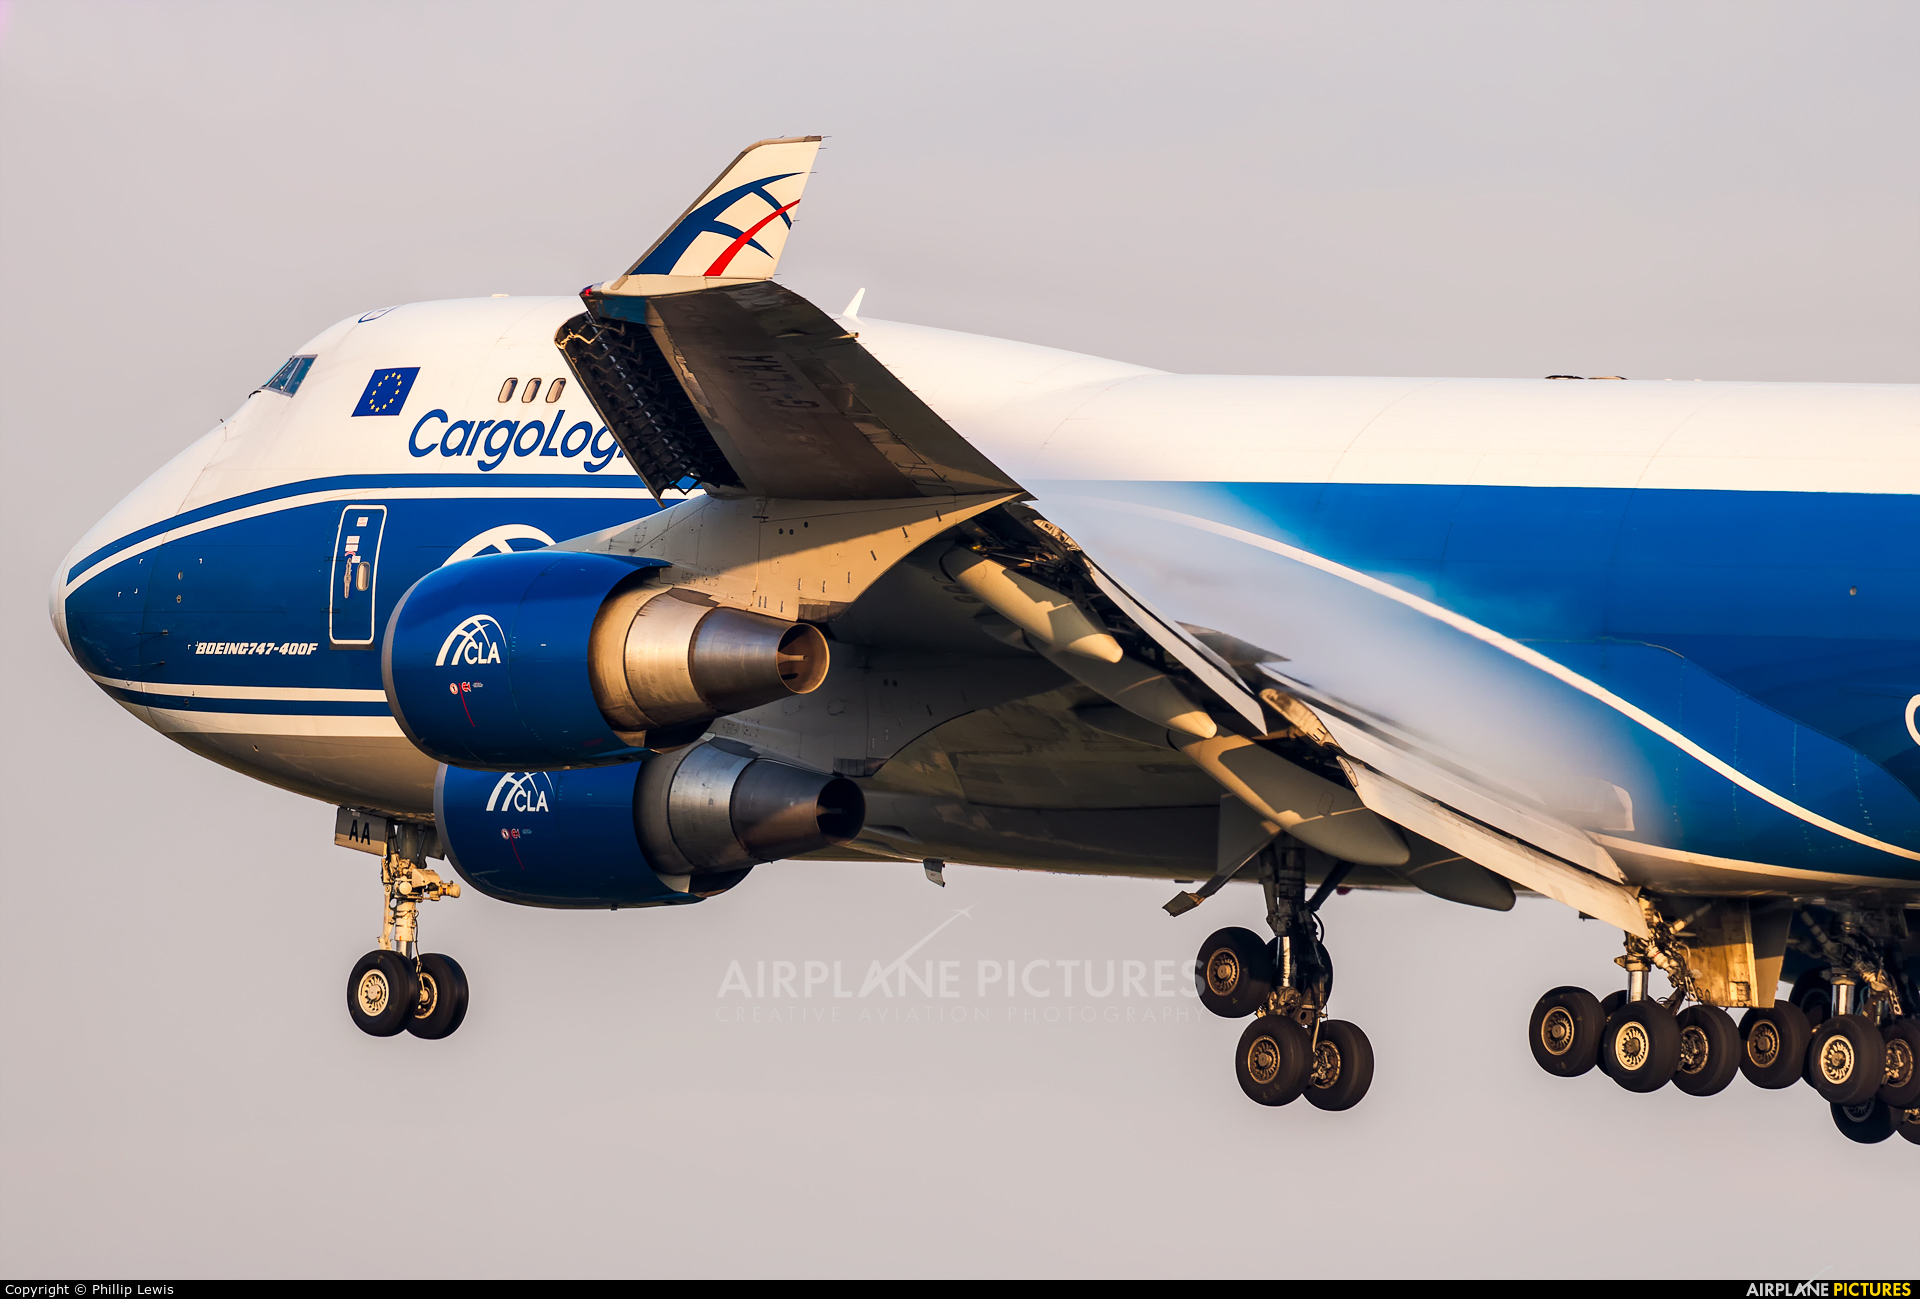 Cargologicair G-CLAA aircraft at Frankfurt